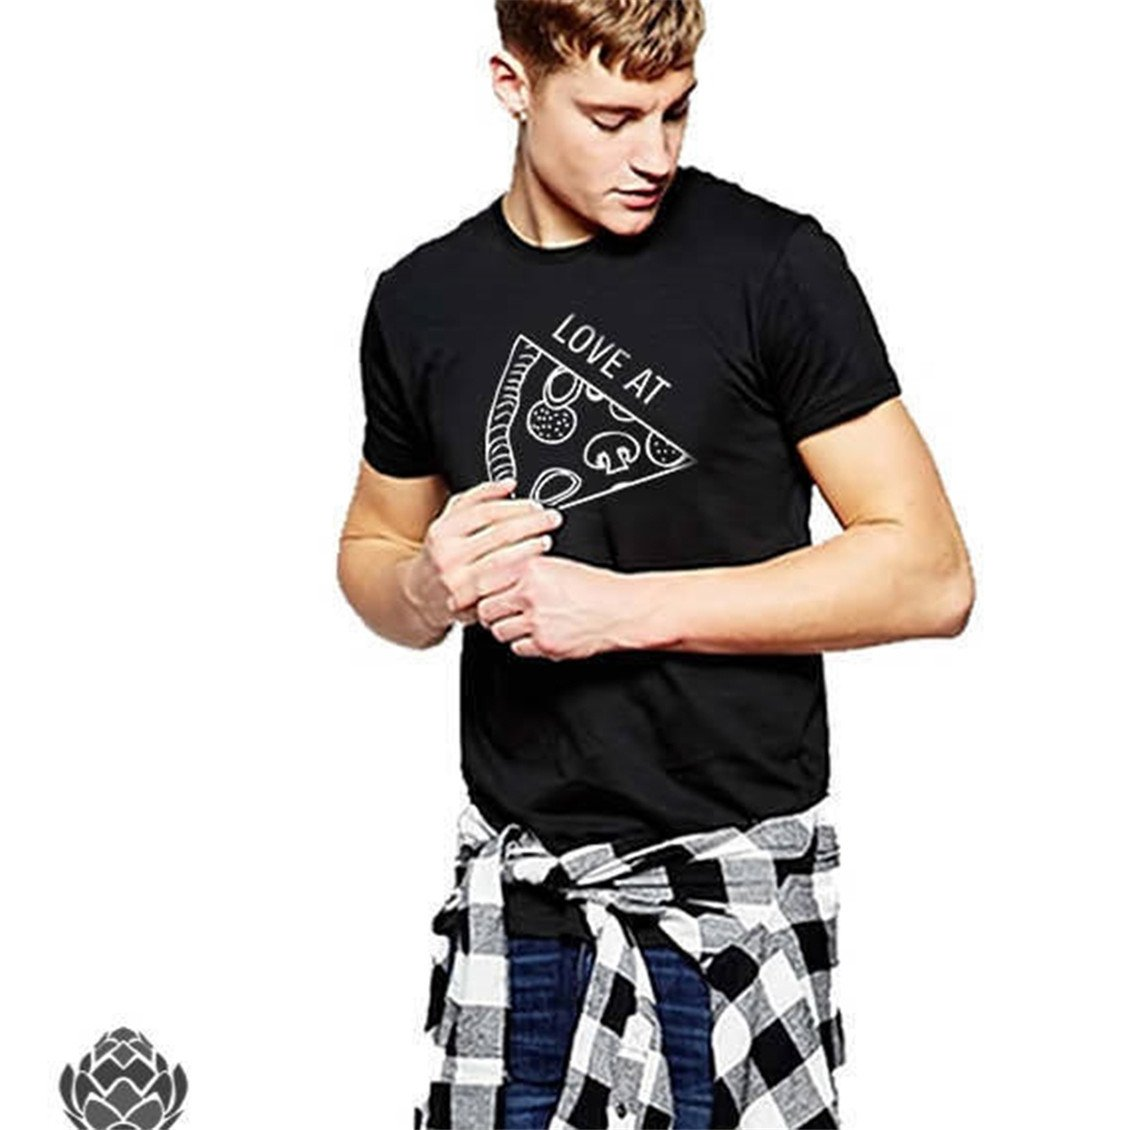 Dolland カップルTシャツ トップス カジュアルプリント 半袖Tシャツ ブラウス ピザ柄 L 68 L Black - Male B07C185PZM